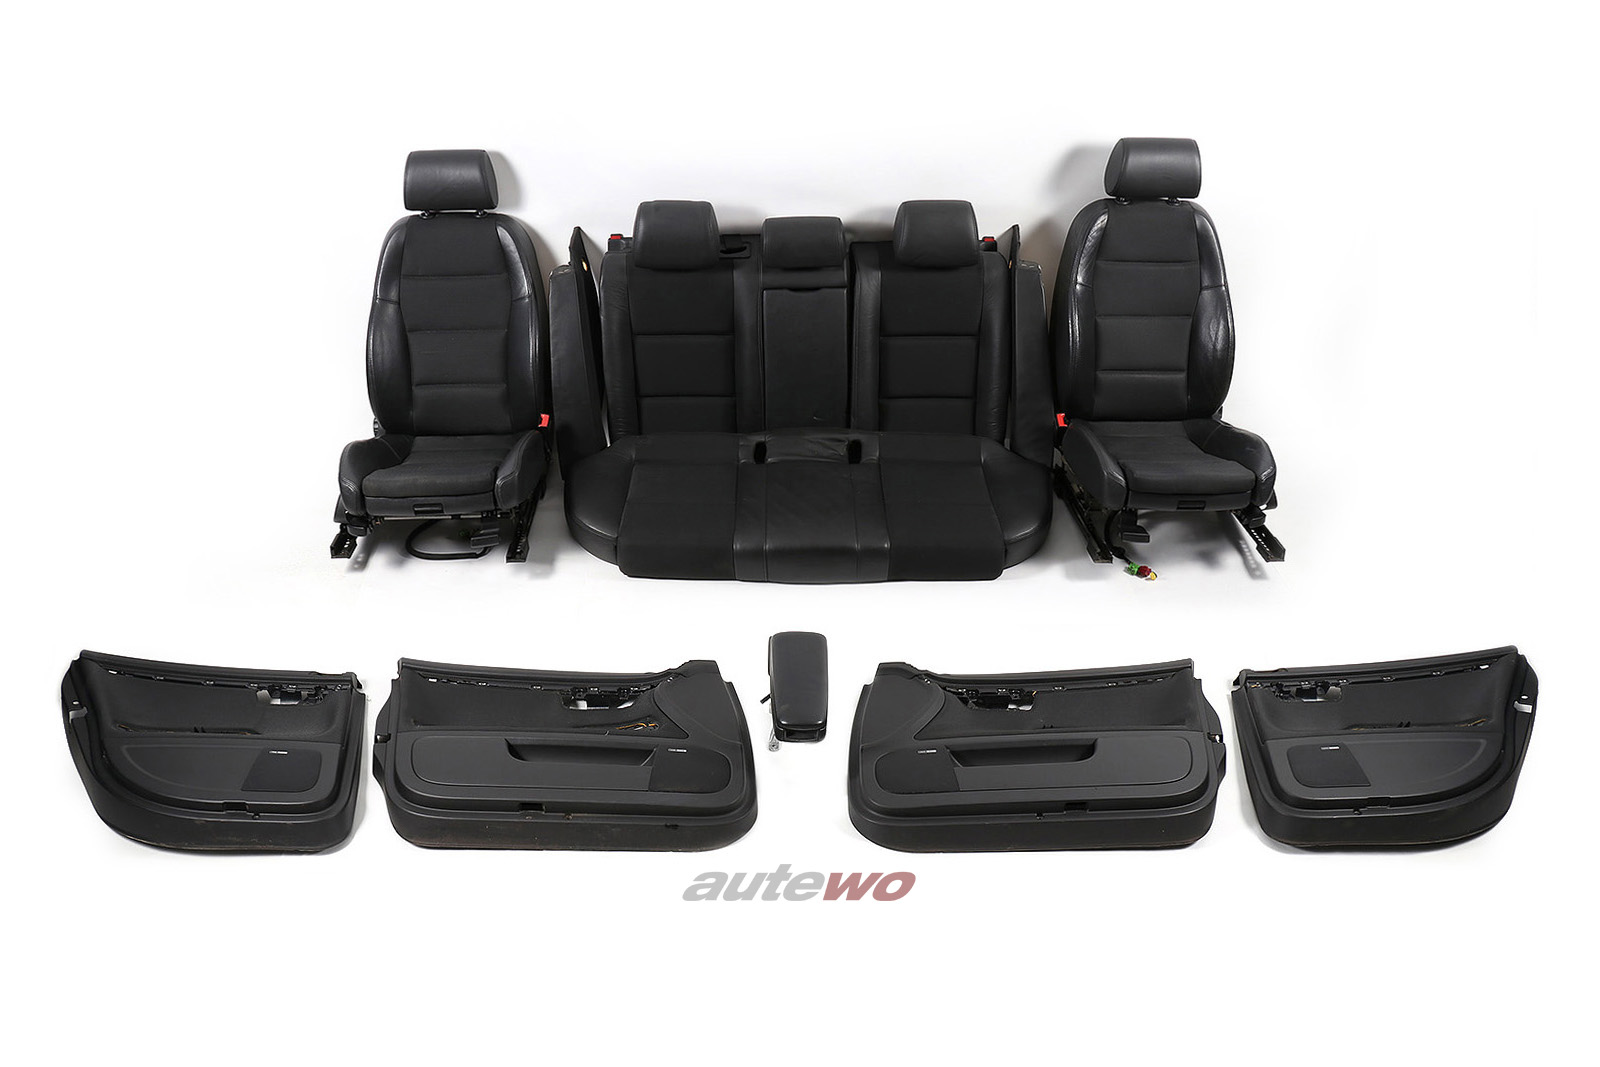 Audi A4/S4 8E Avant Innenausstattung Stoff/Teil-Leder Sportsitze Sitzheizung